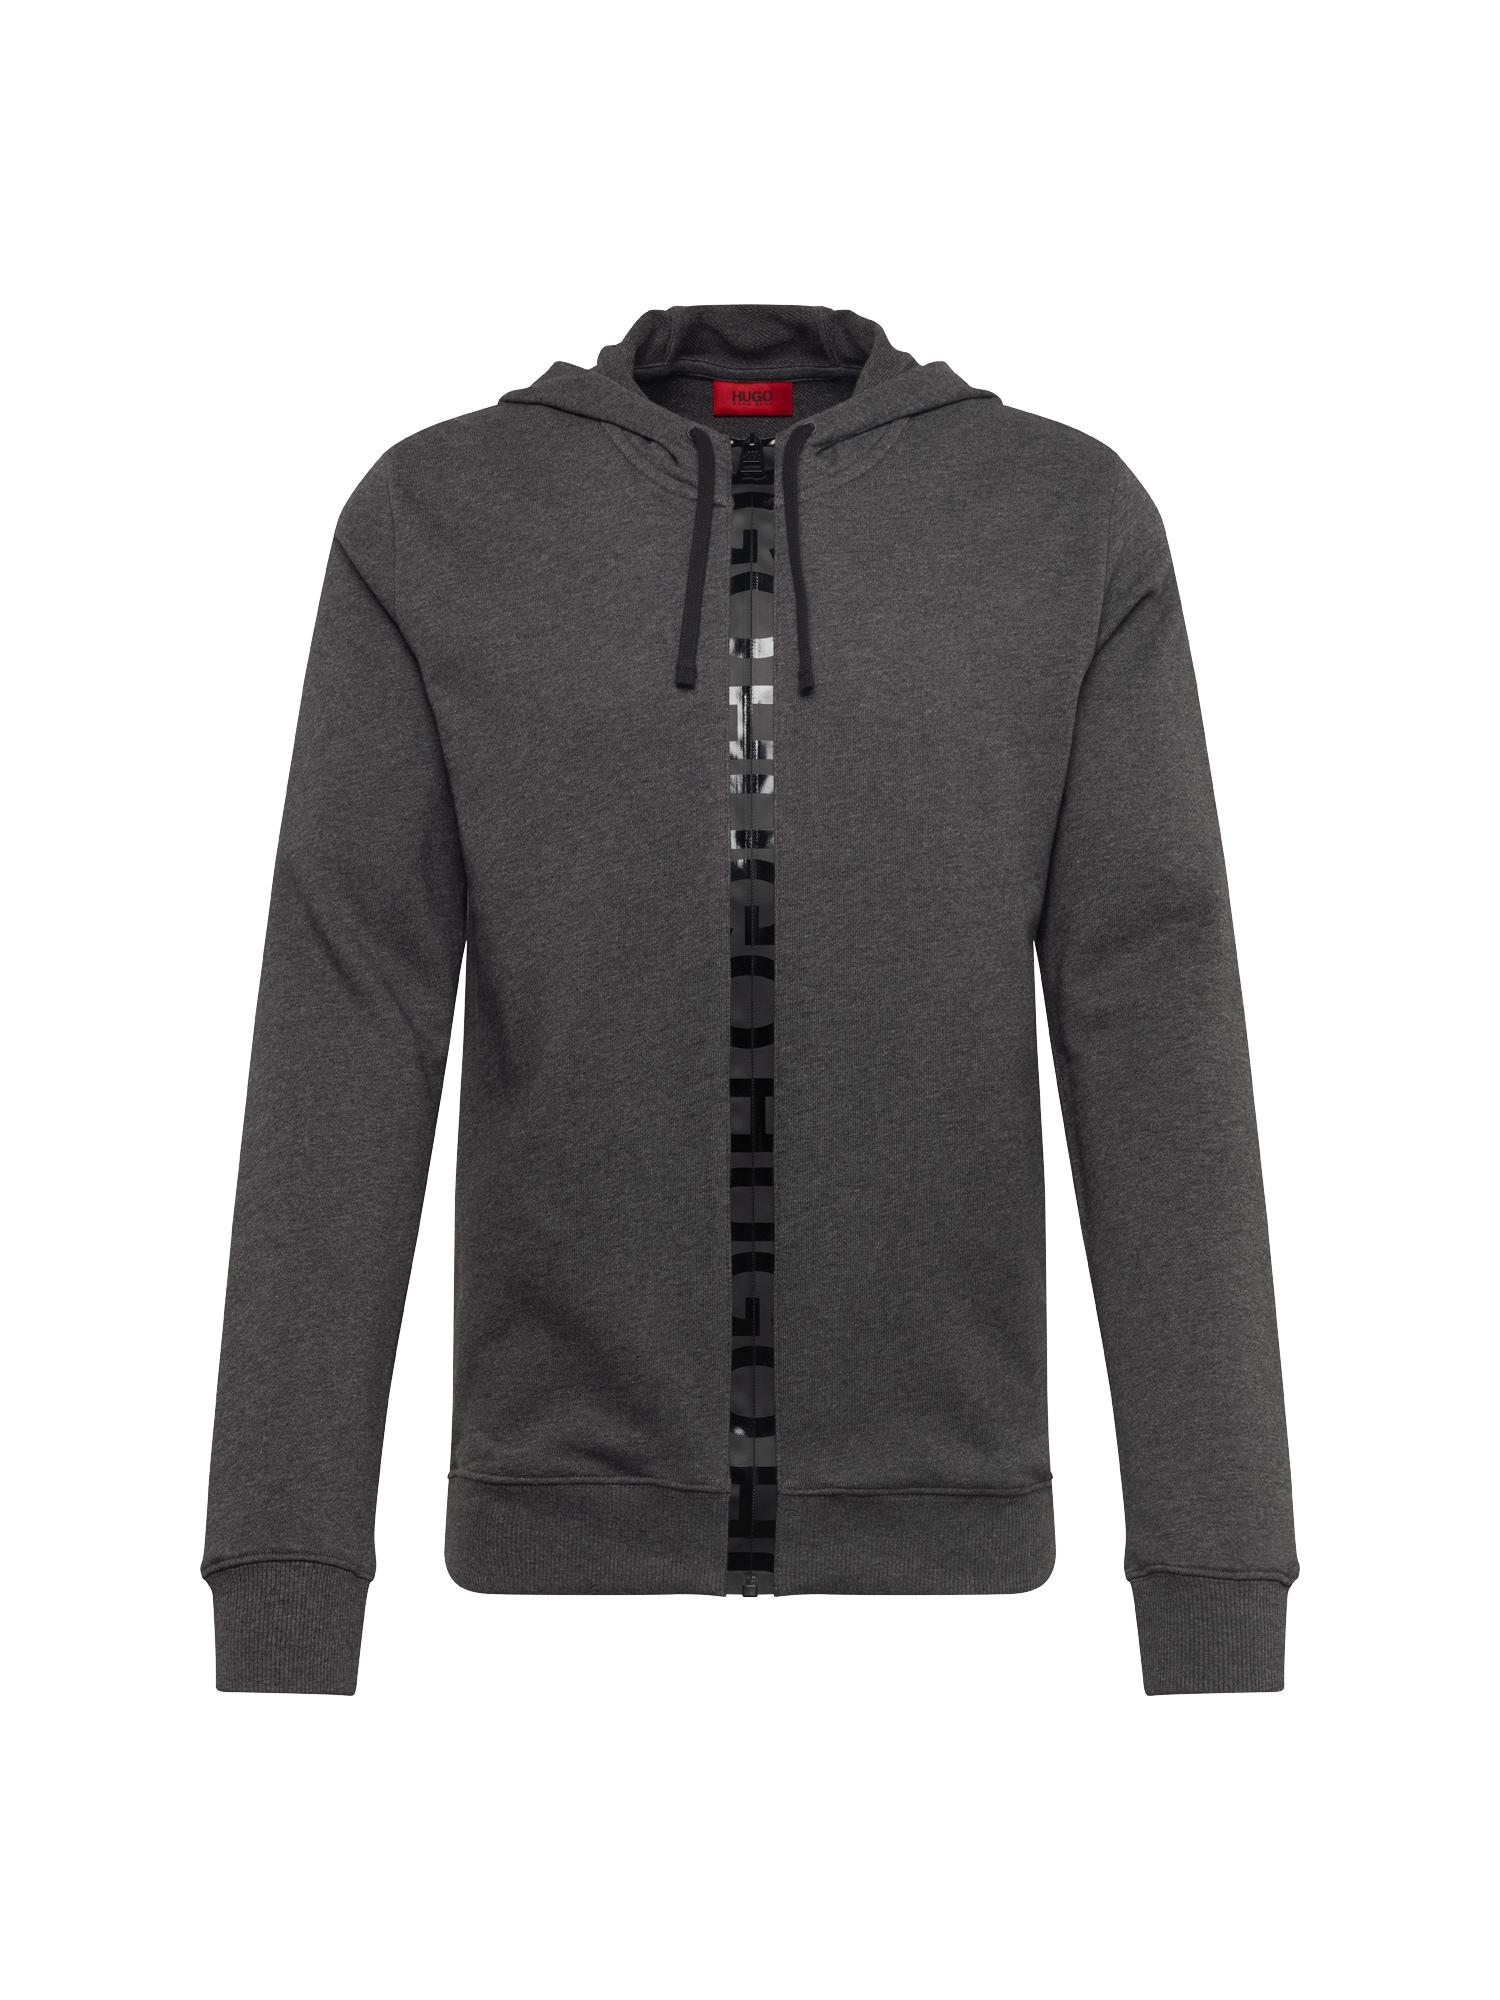 Mikina s kapucí Daple-U2 10187077 01 šedá HUGO